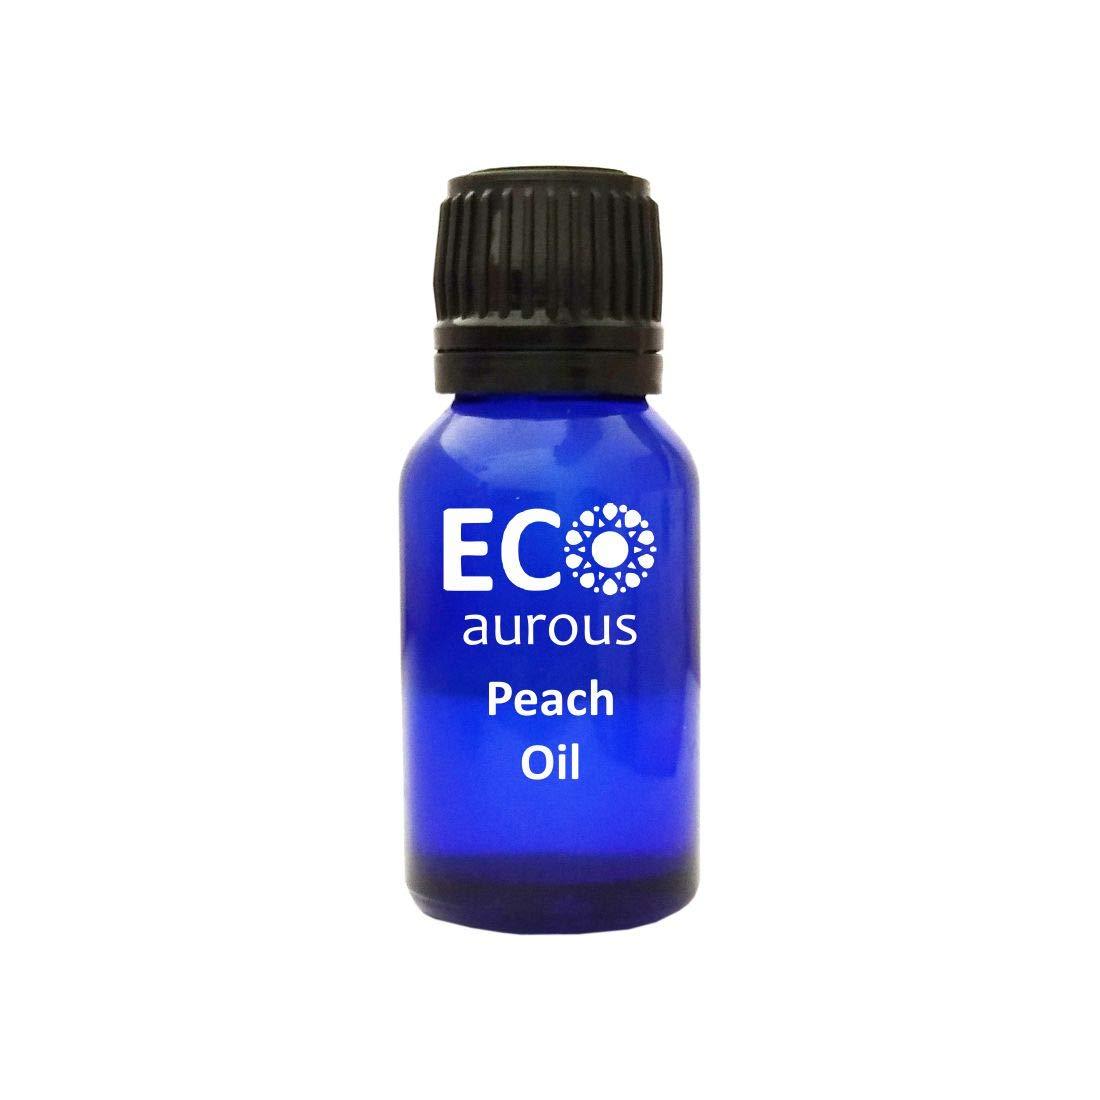 Peach Oil (Prunus Persica) 100% Natural, Organic, Vegan & Cruelty Free Peach Carrier Oil | Pure Peach Oil By Eco Aurous (2000 ml)